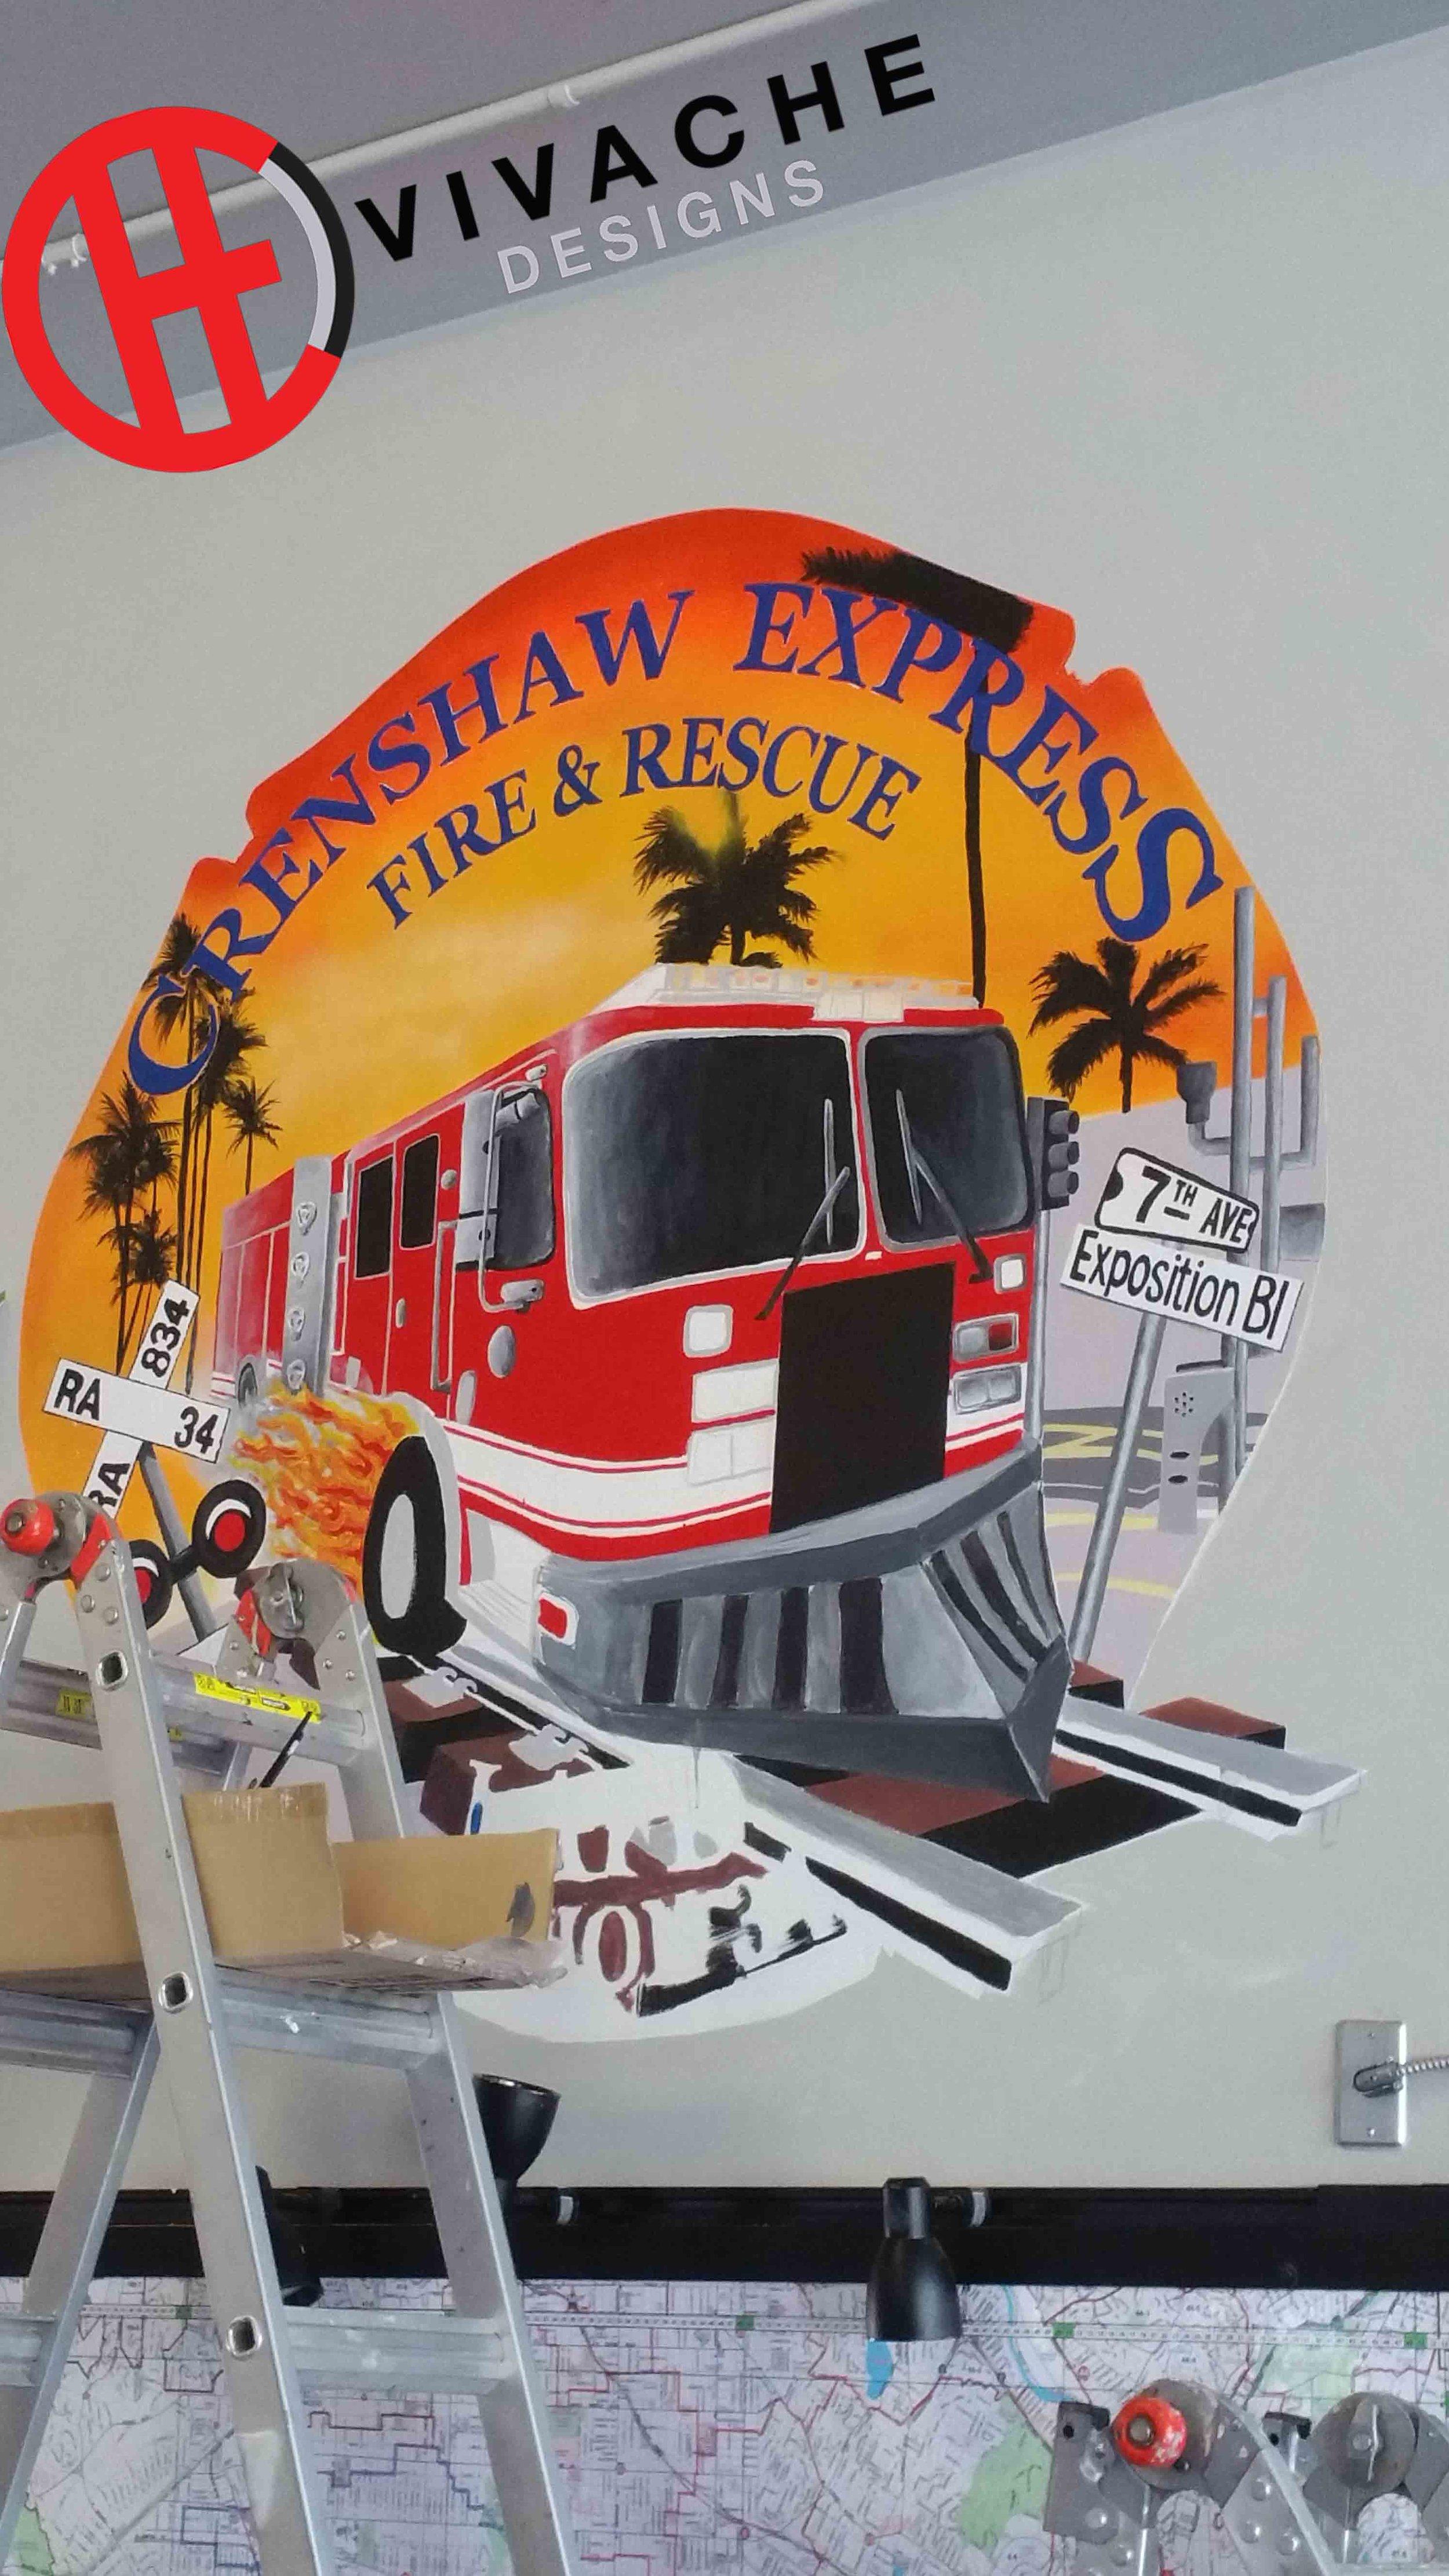 Vivache Designs Painted Wall Murals LAFD Fire Station Mural copy.jpg